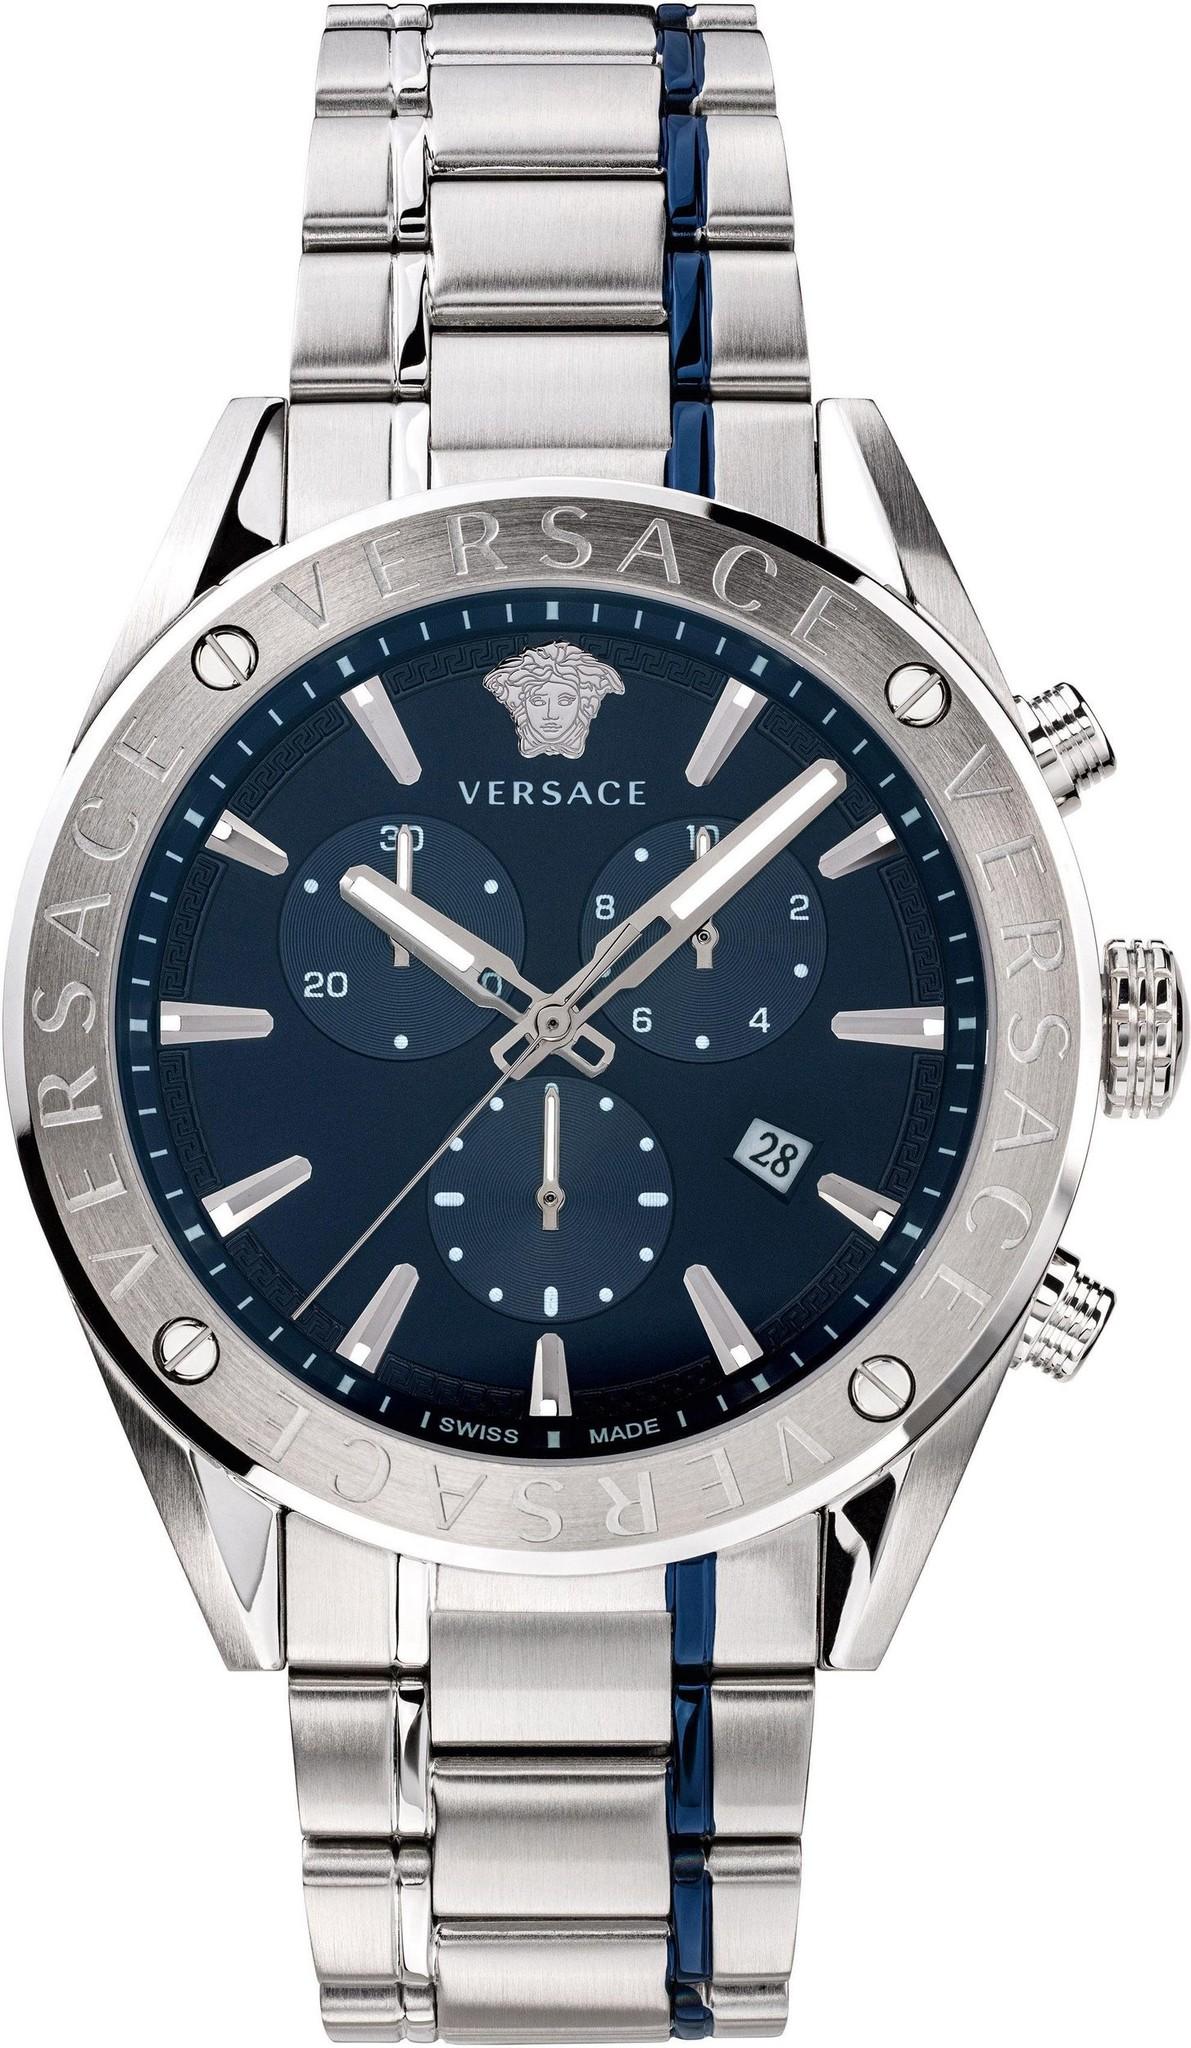 Versace VEHB00519 V-Chrono heren horloge chronograaf